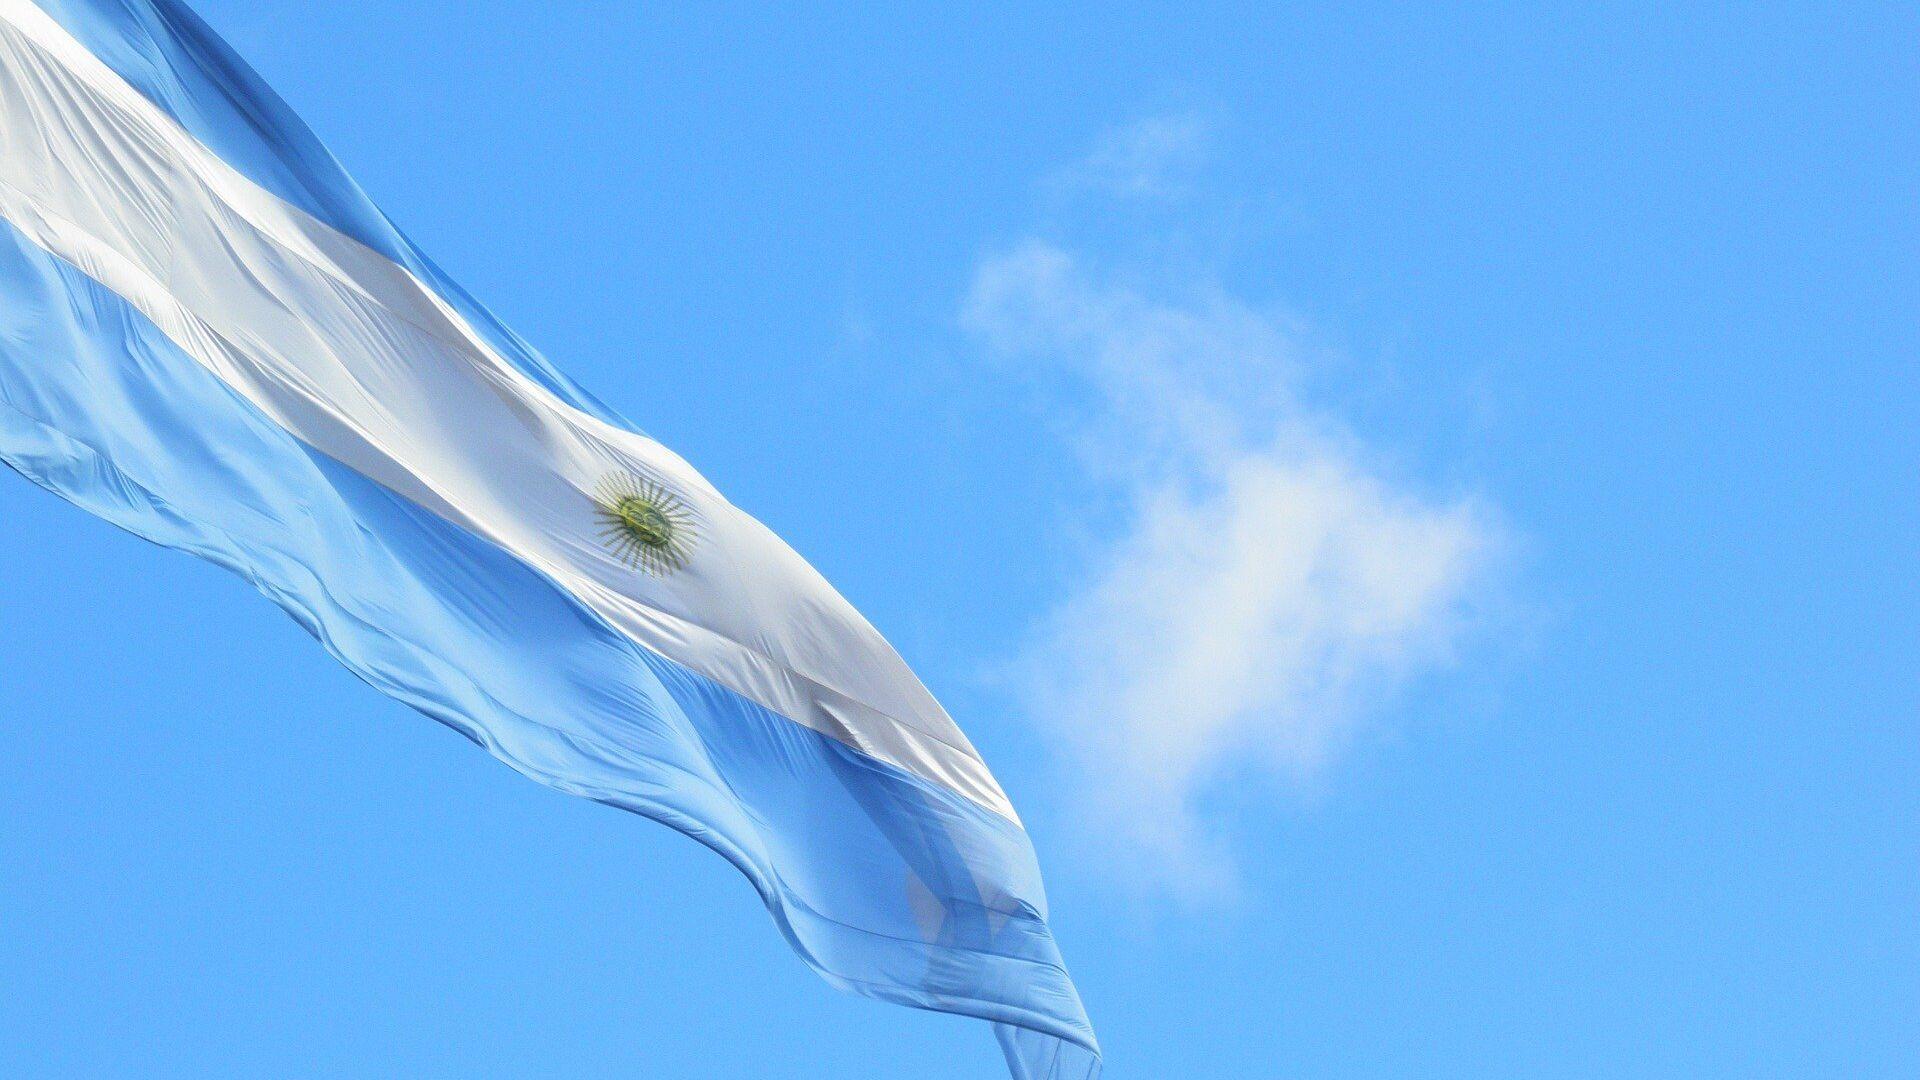 Bandera de Argentina - Sputnik Mundo, 1920, 19.03.2021